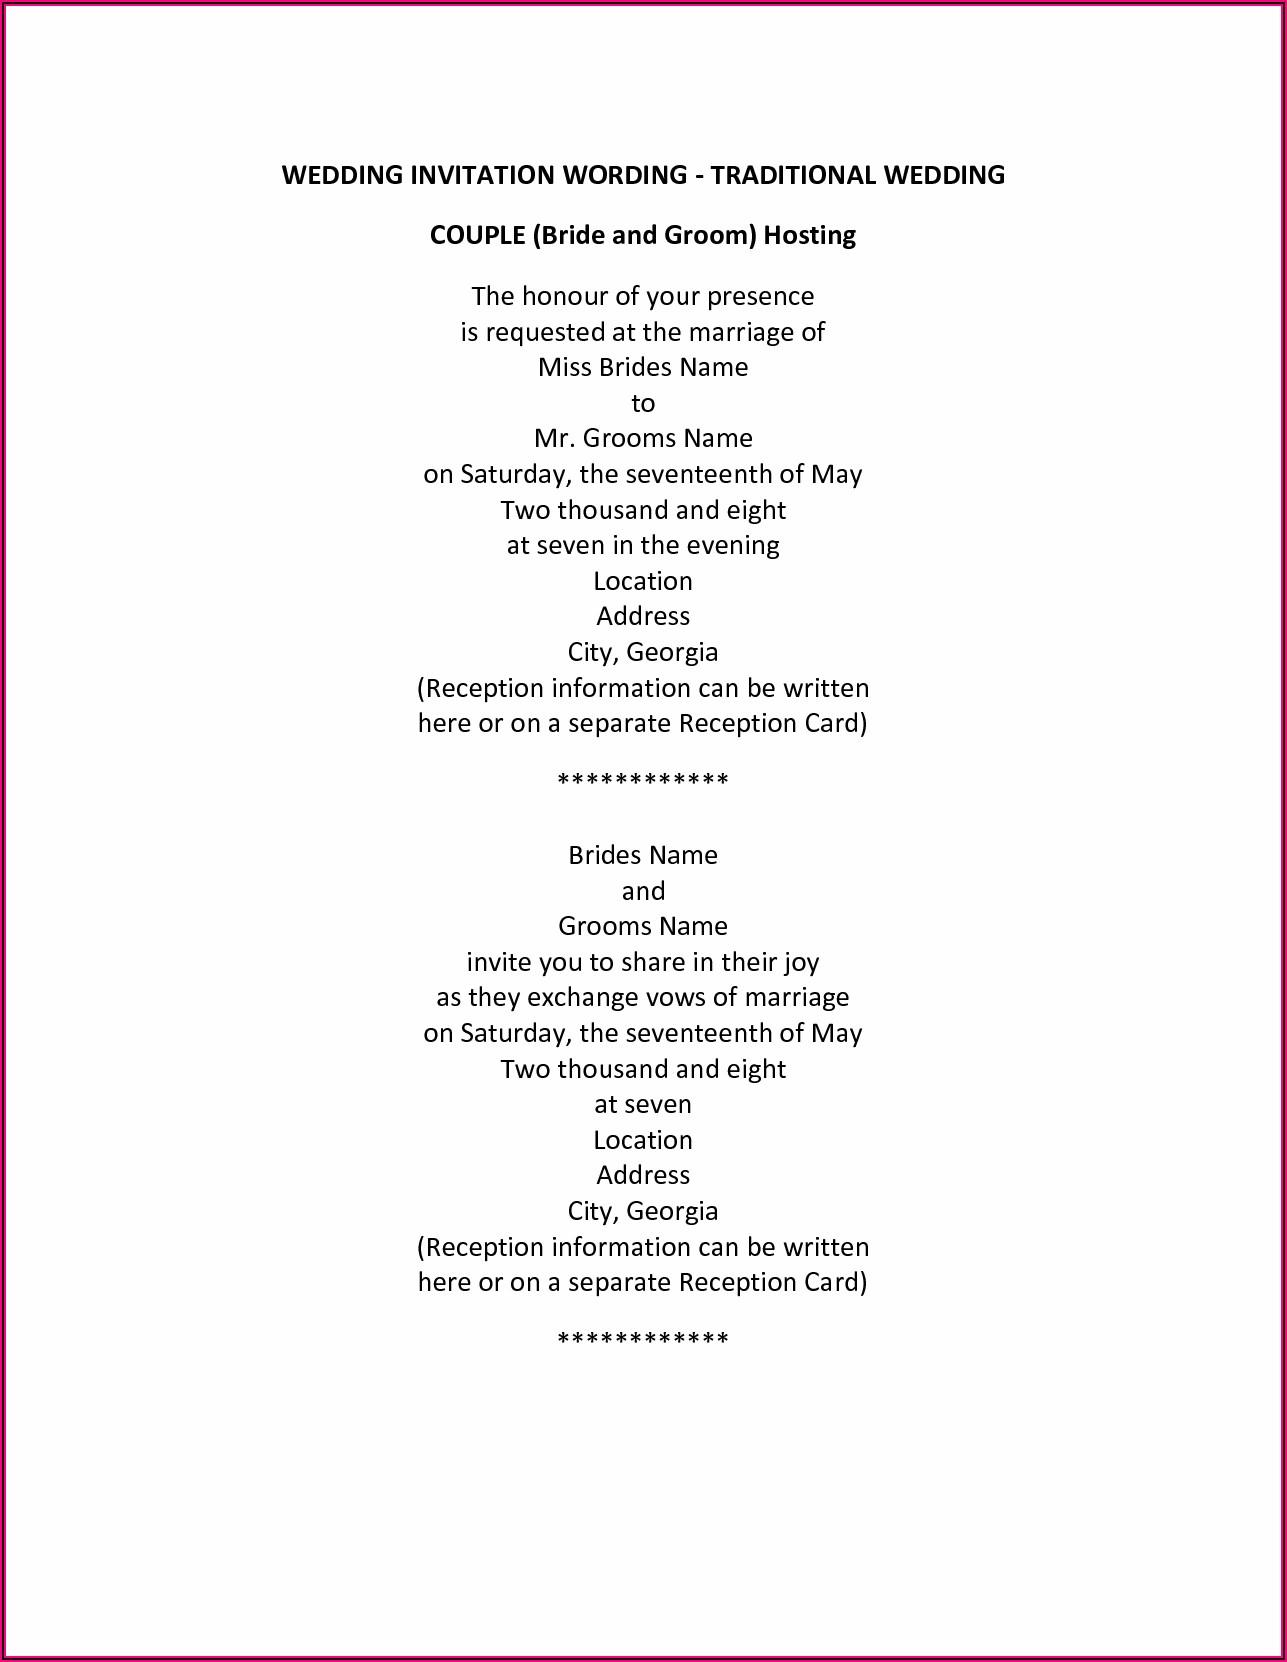 Wedding Invitation Wording Couple Hosting Formal